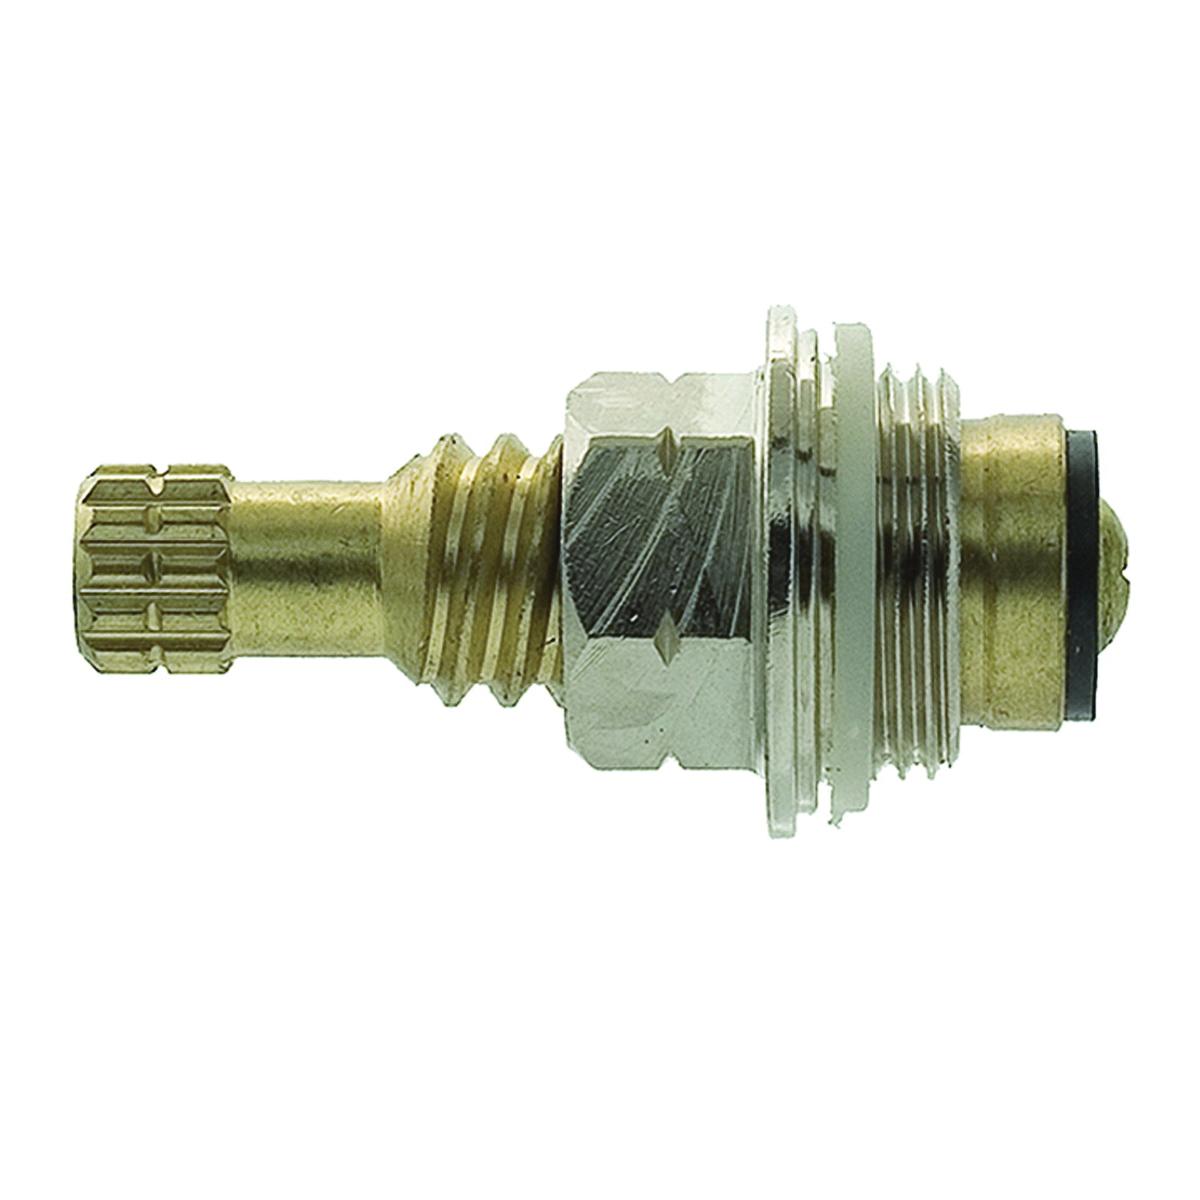 Picture of Danco 15288E Faucet Stem, Brass, Brass, 1-55/64 in L